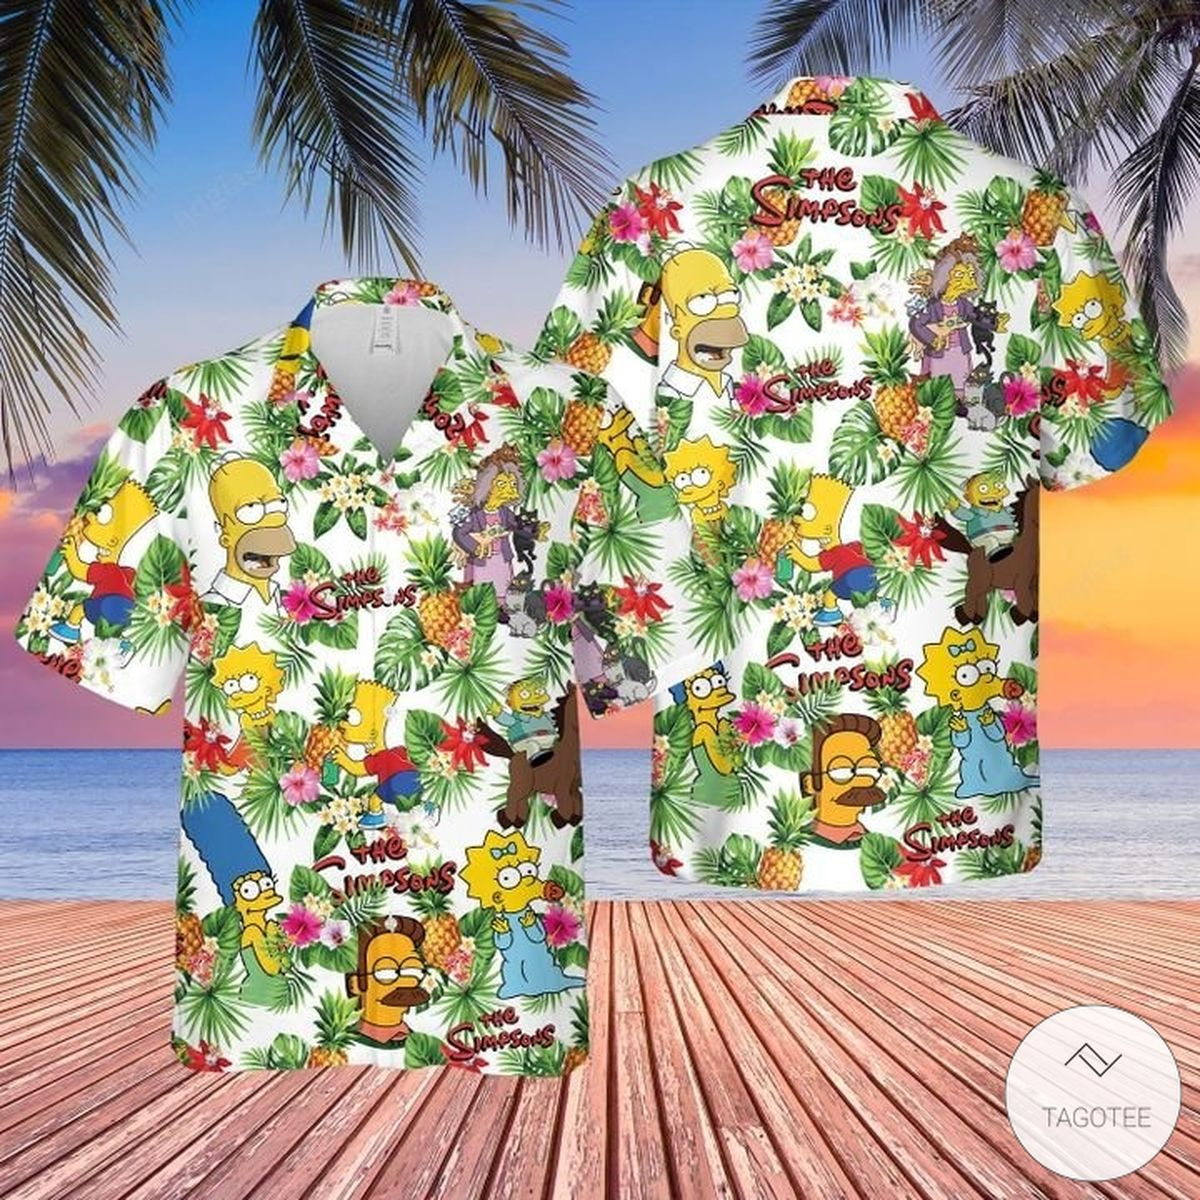 The Simpsons Tropical Hawaiian Shirt, Beach Shorts